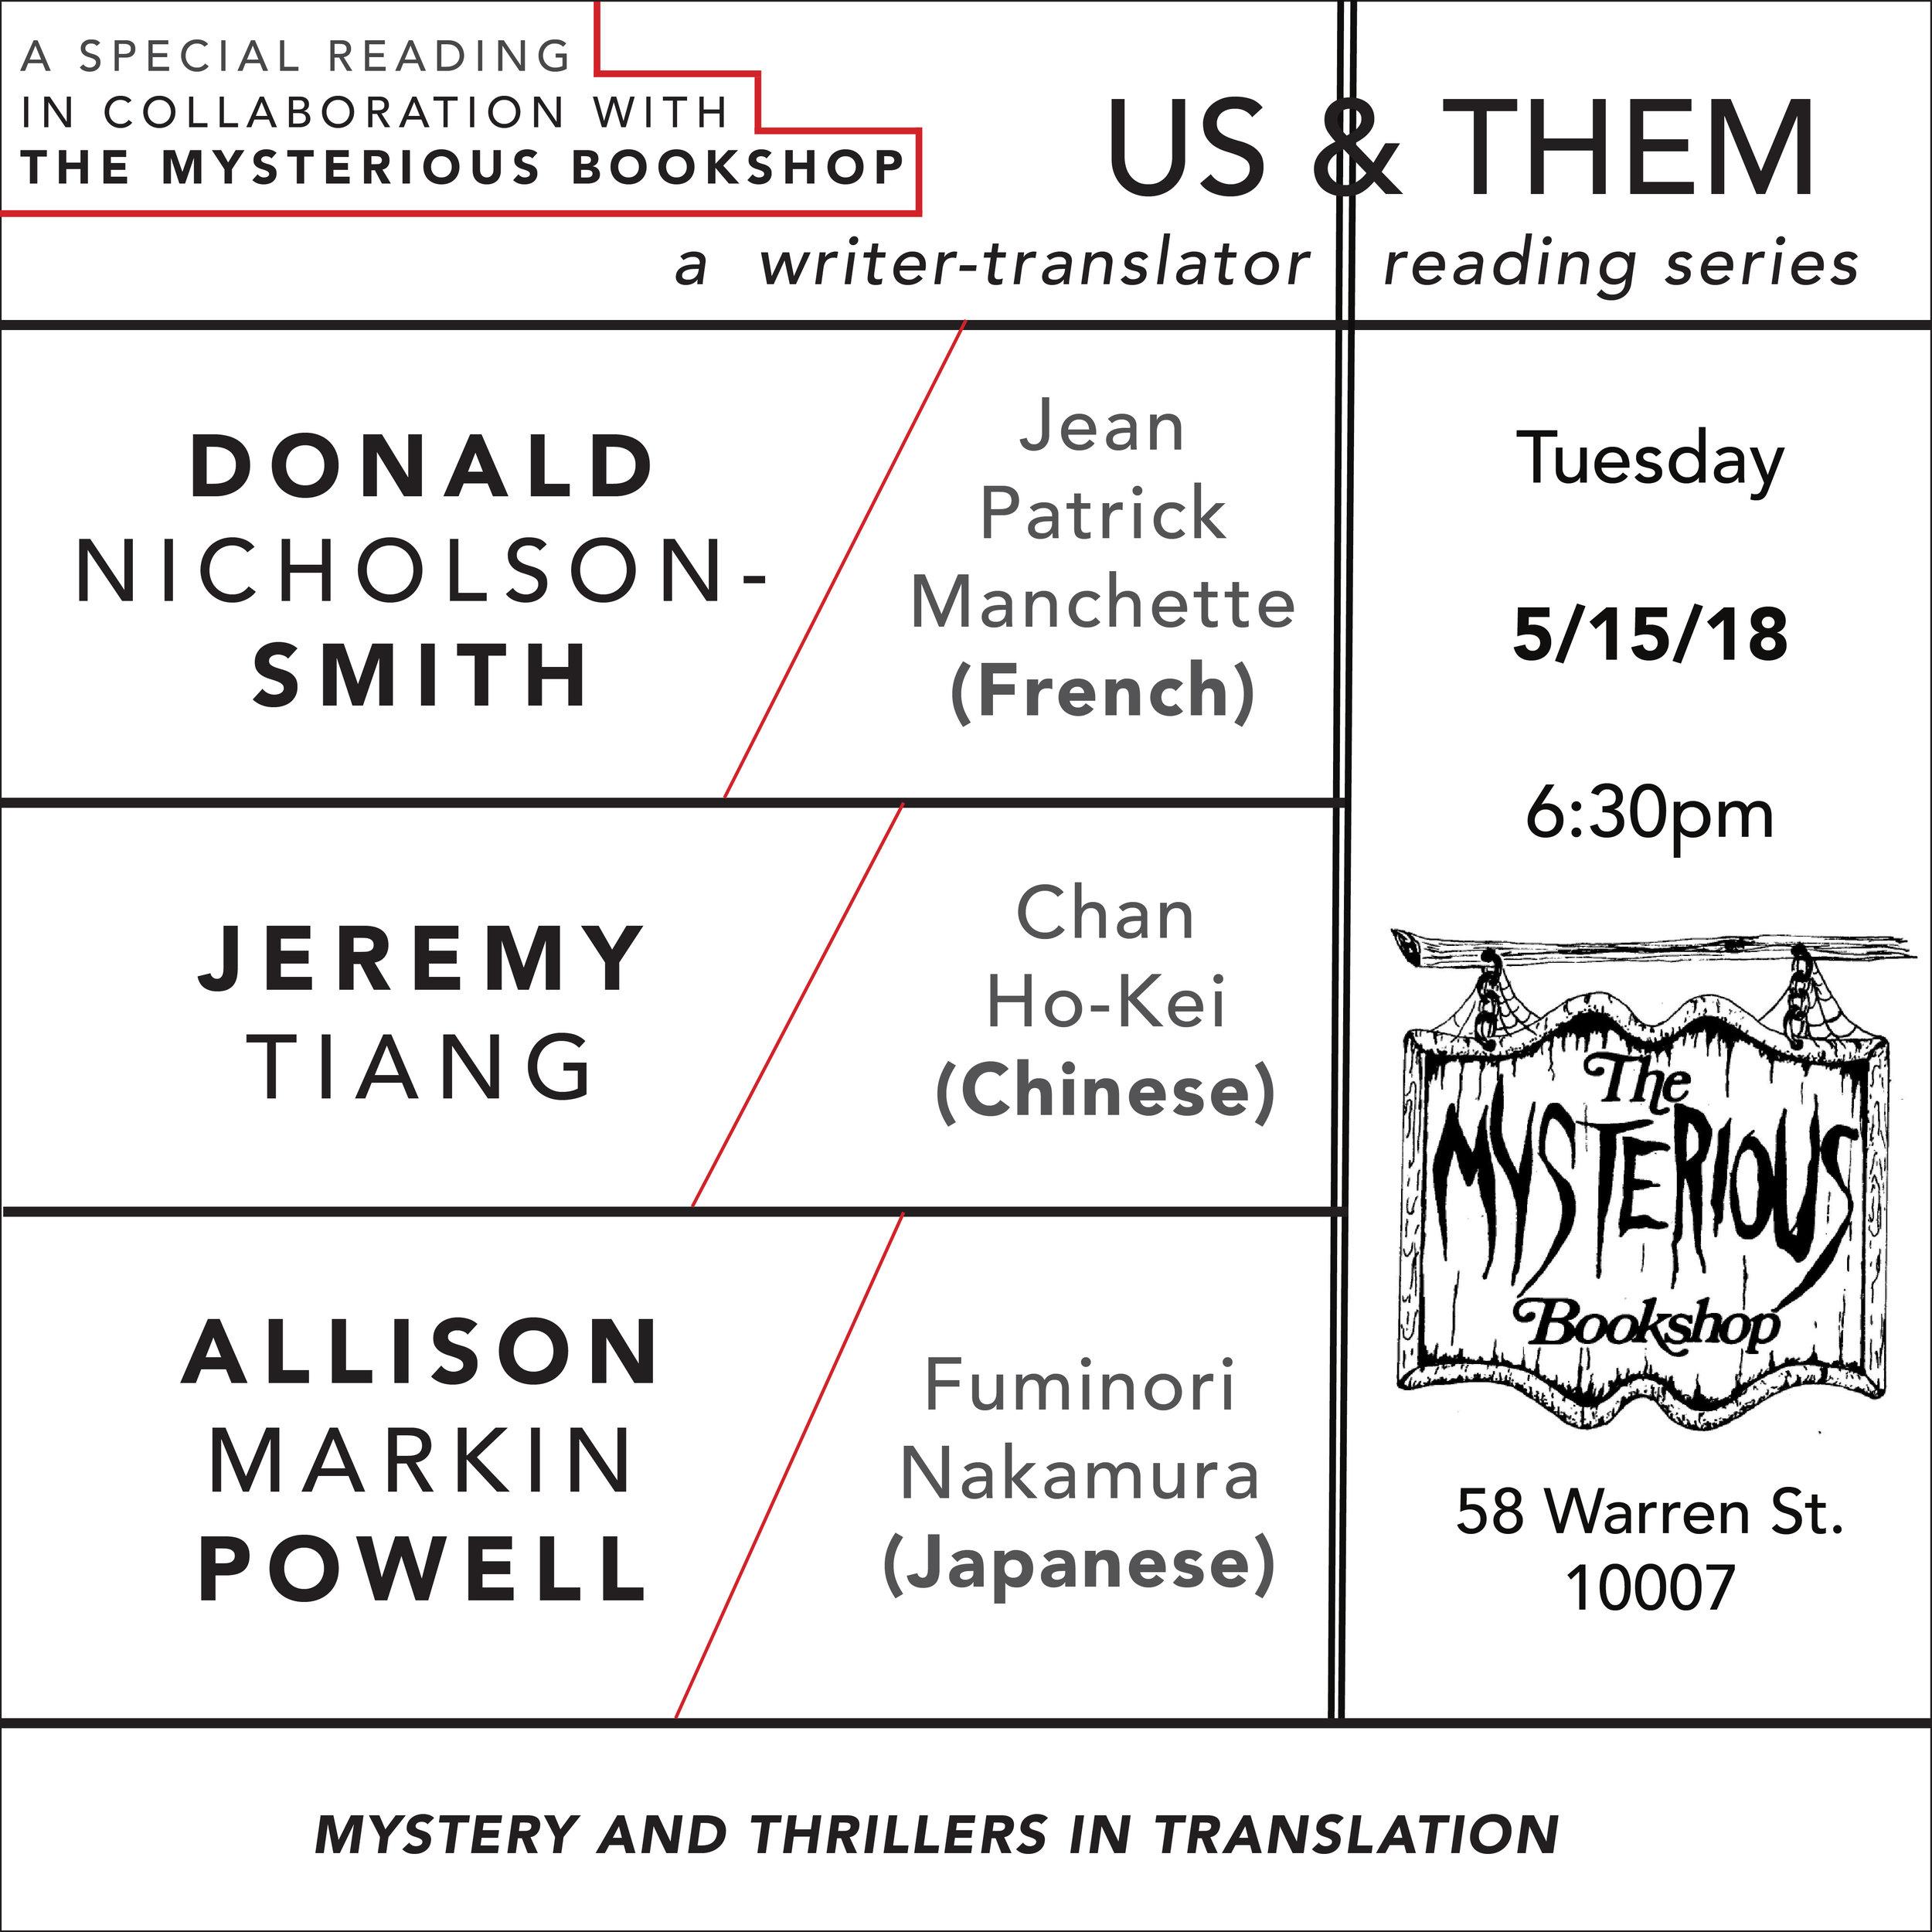 2018_Mysterious Bookshop flyer_r3.jpg